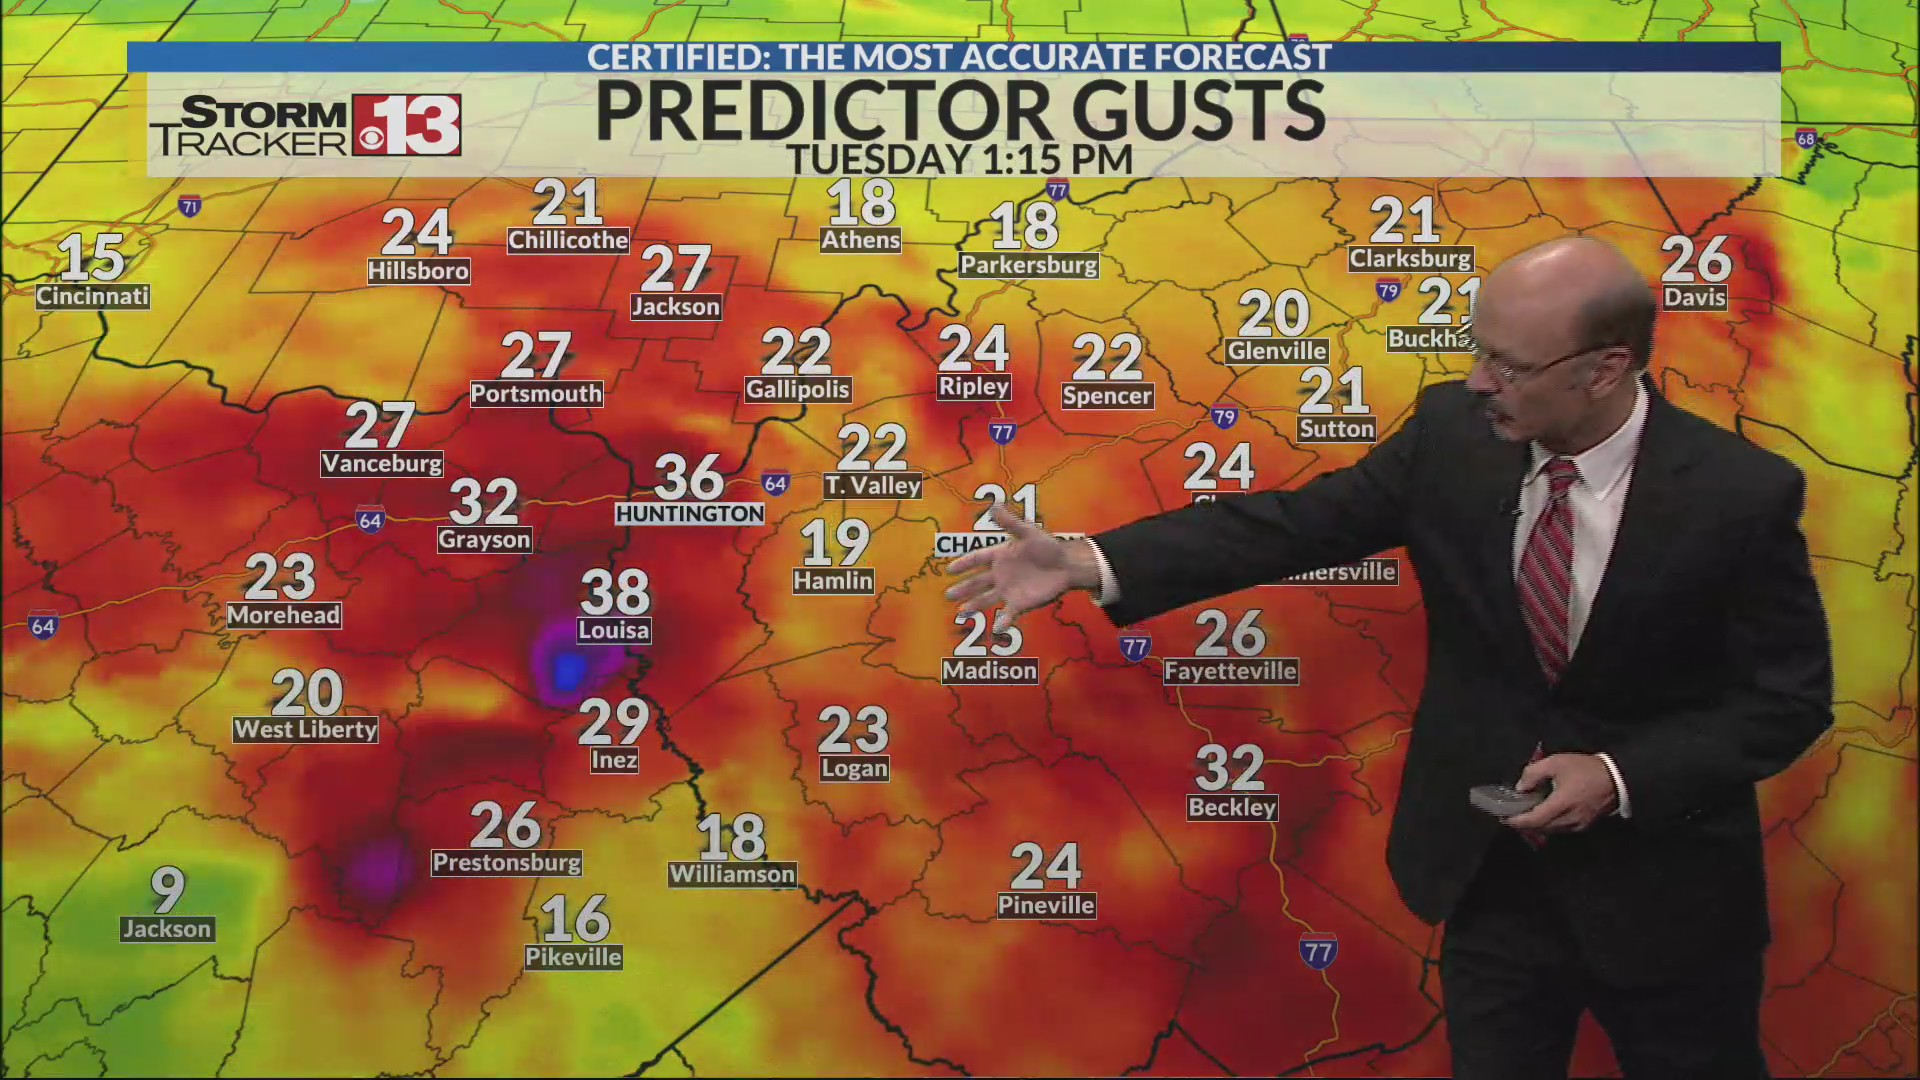 Charleston-Huntington News & Weather | Charleston-Huntington, WV